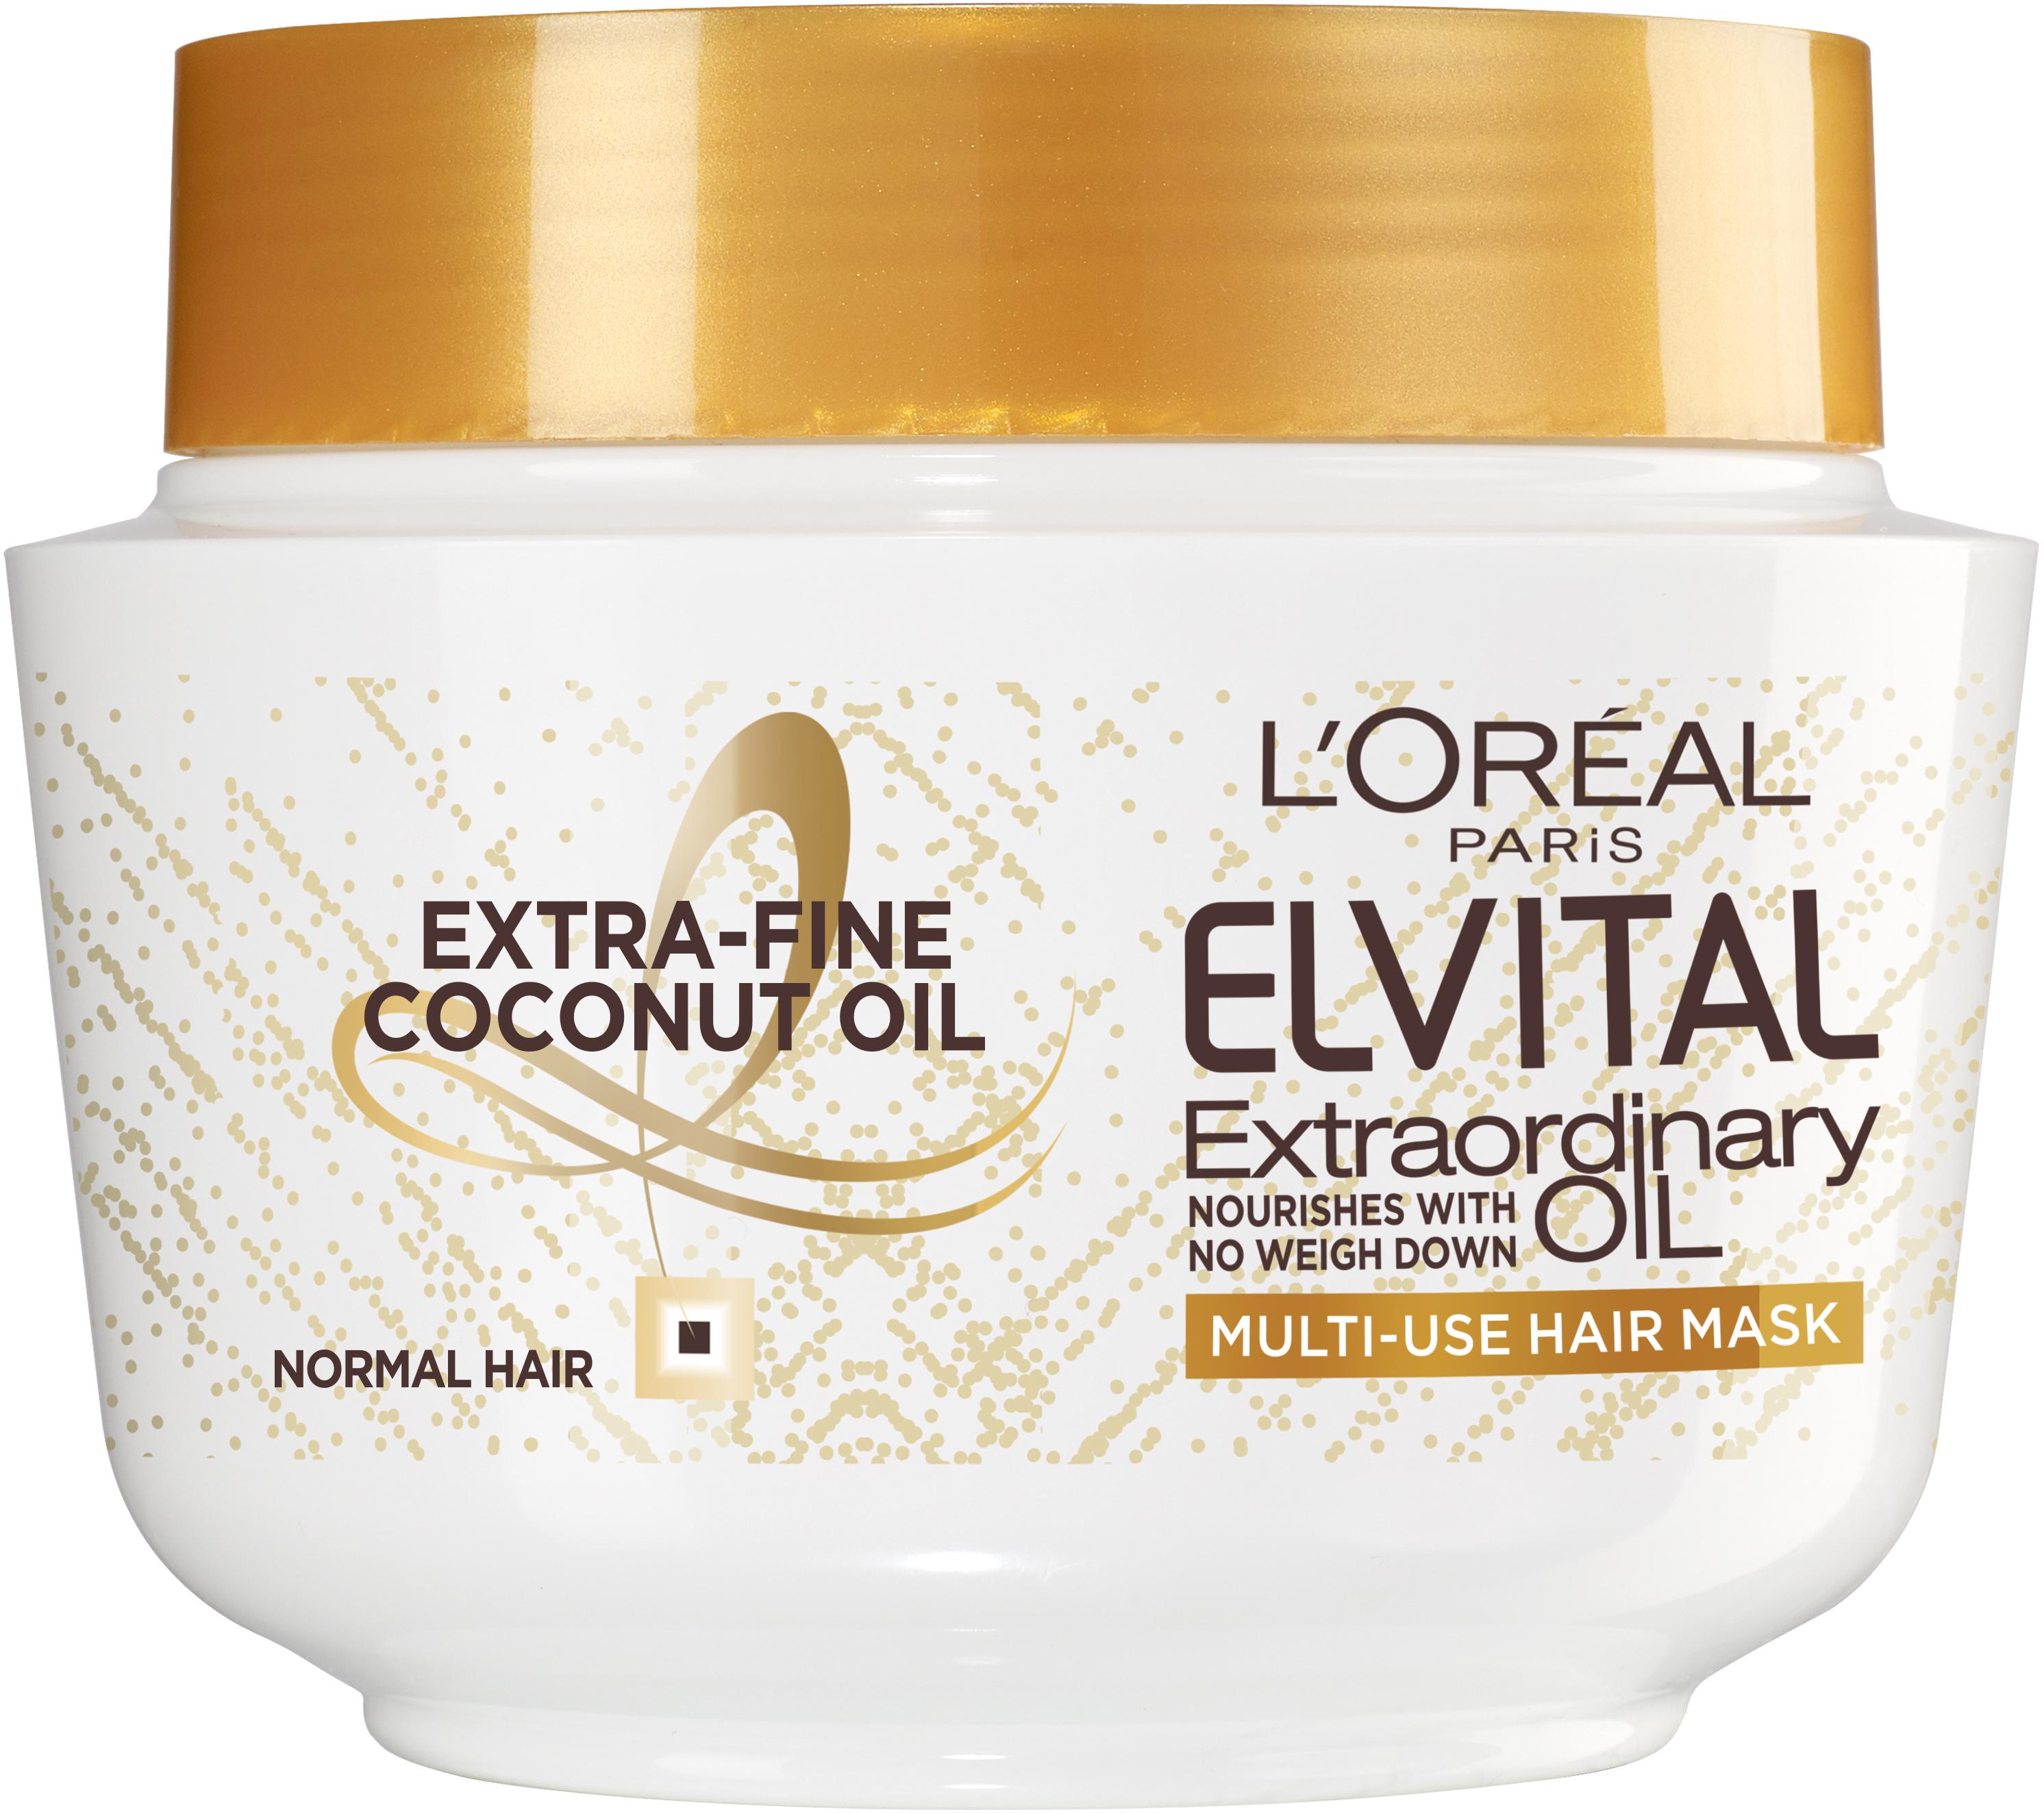 Elvital Extraordinary Coconut Oil Multi-Use Hair Mask 300ml